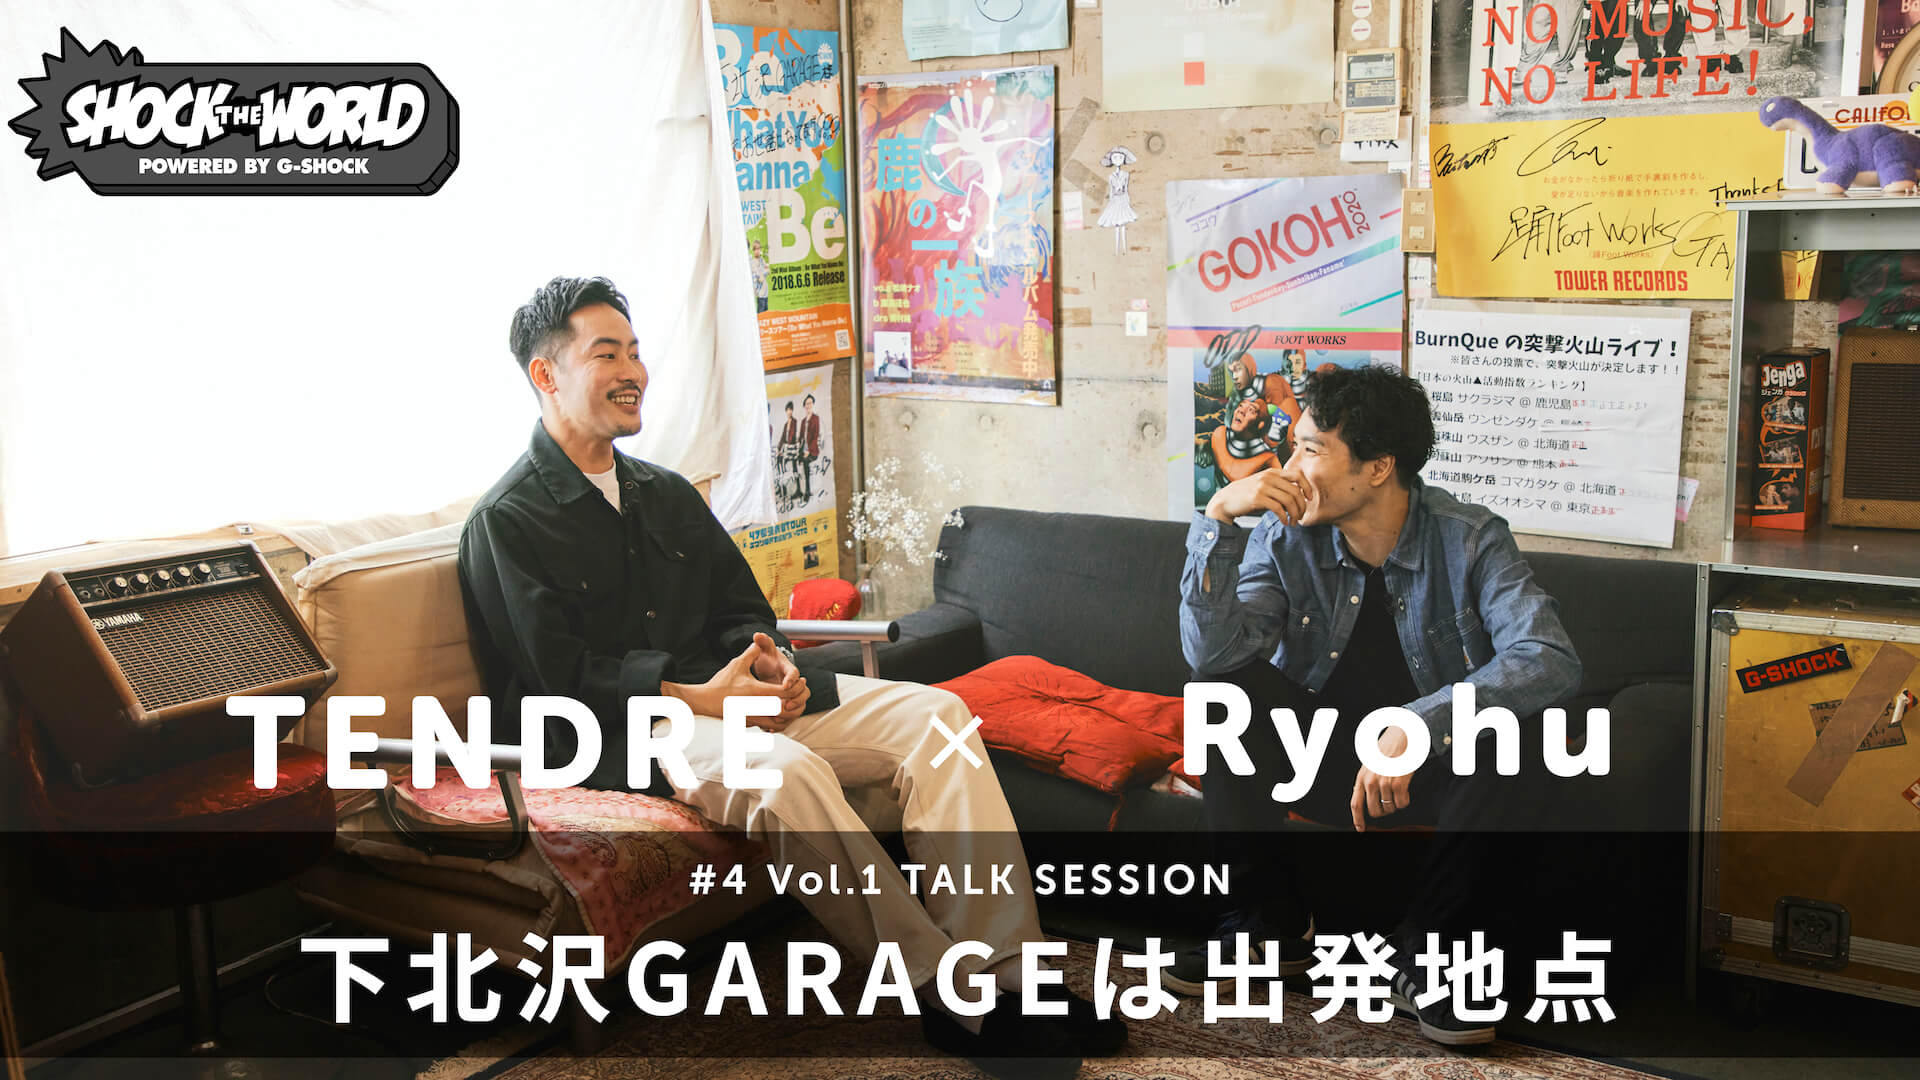 G-SHOCK『SHOCK THE WORLD』にTENDRE、Ryohuが登場!ふたりによる対談映像が解禁 life210614_tendre_ryohu_3